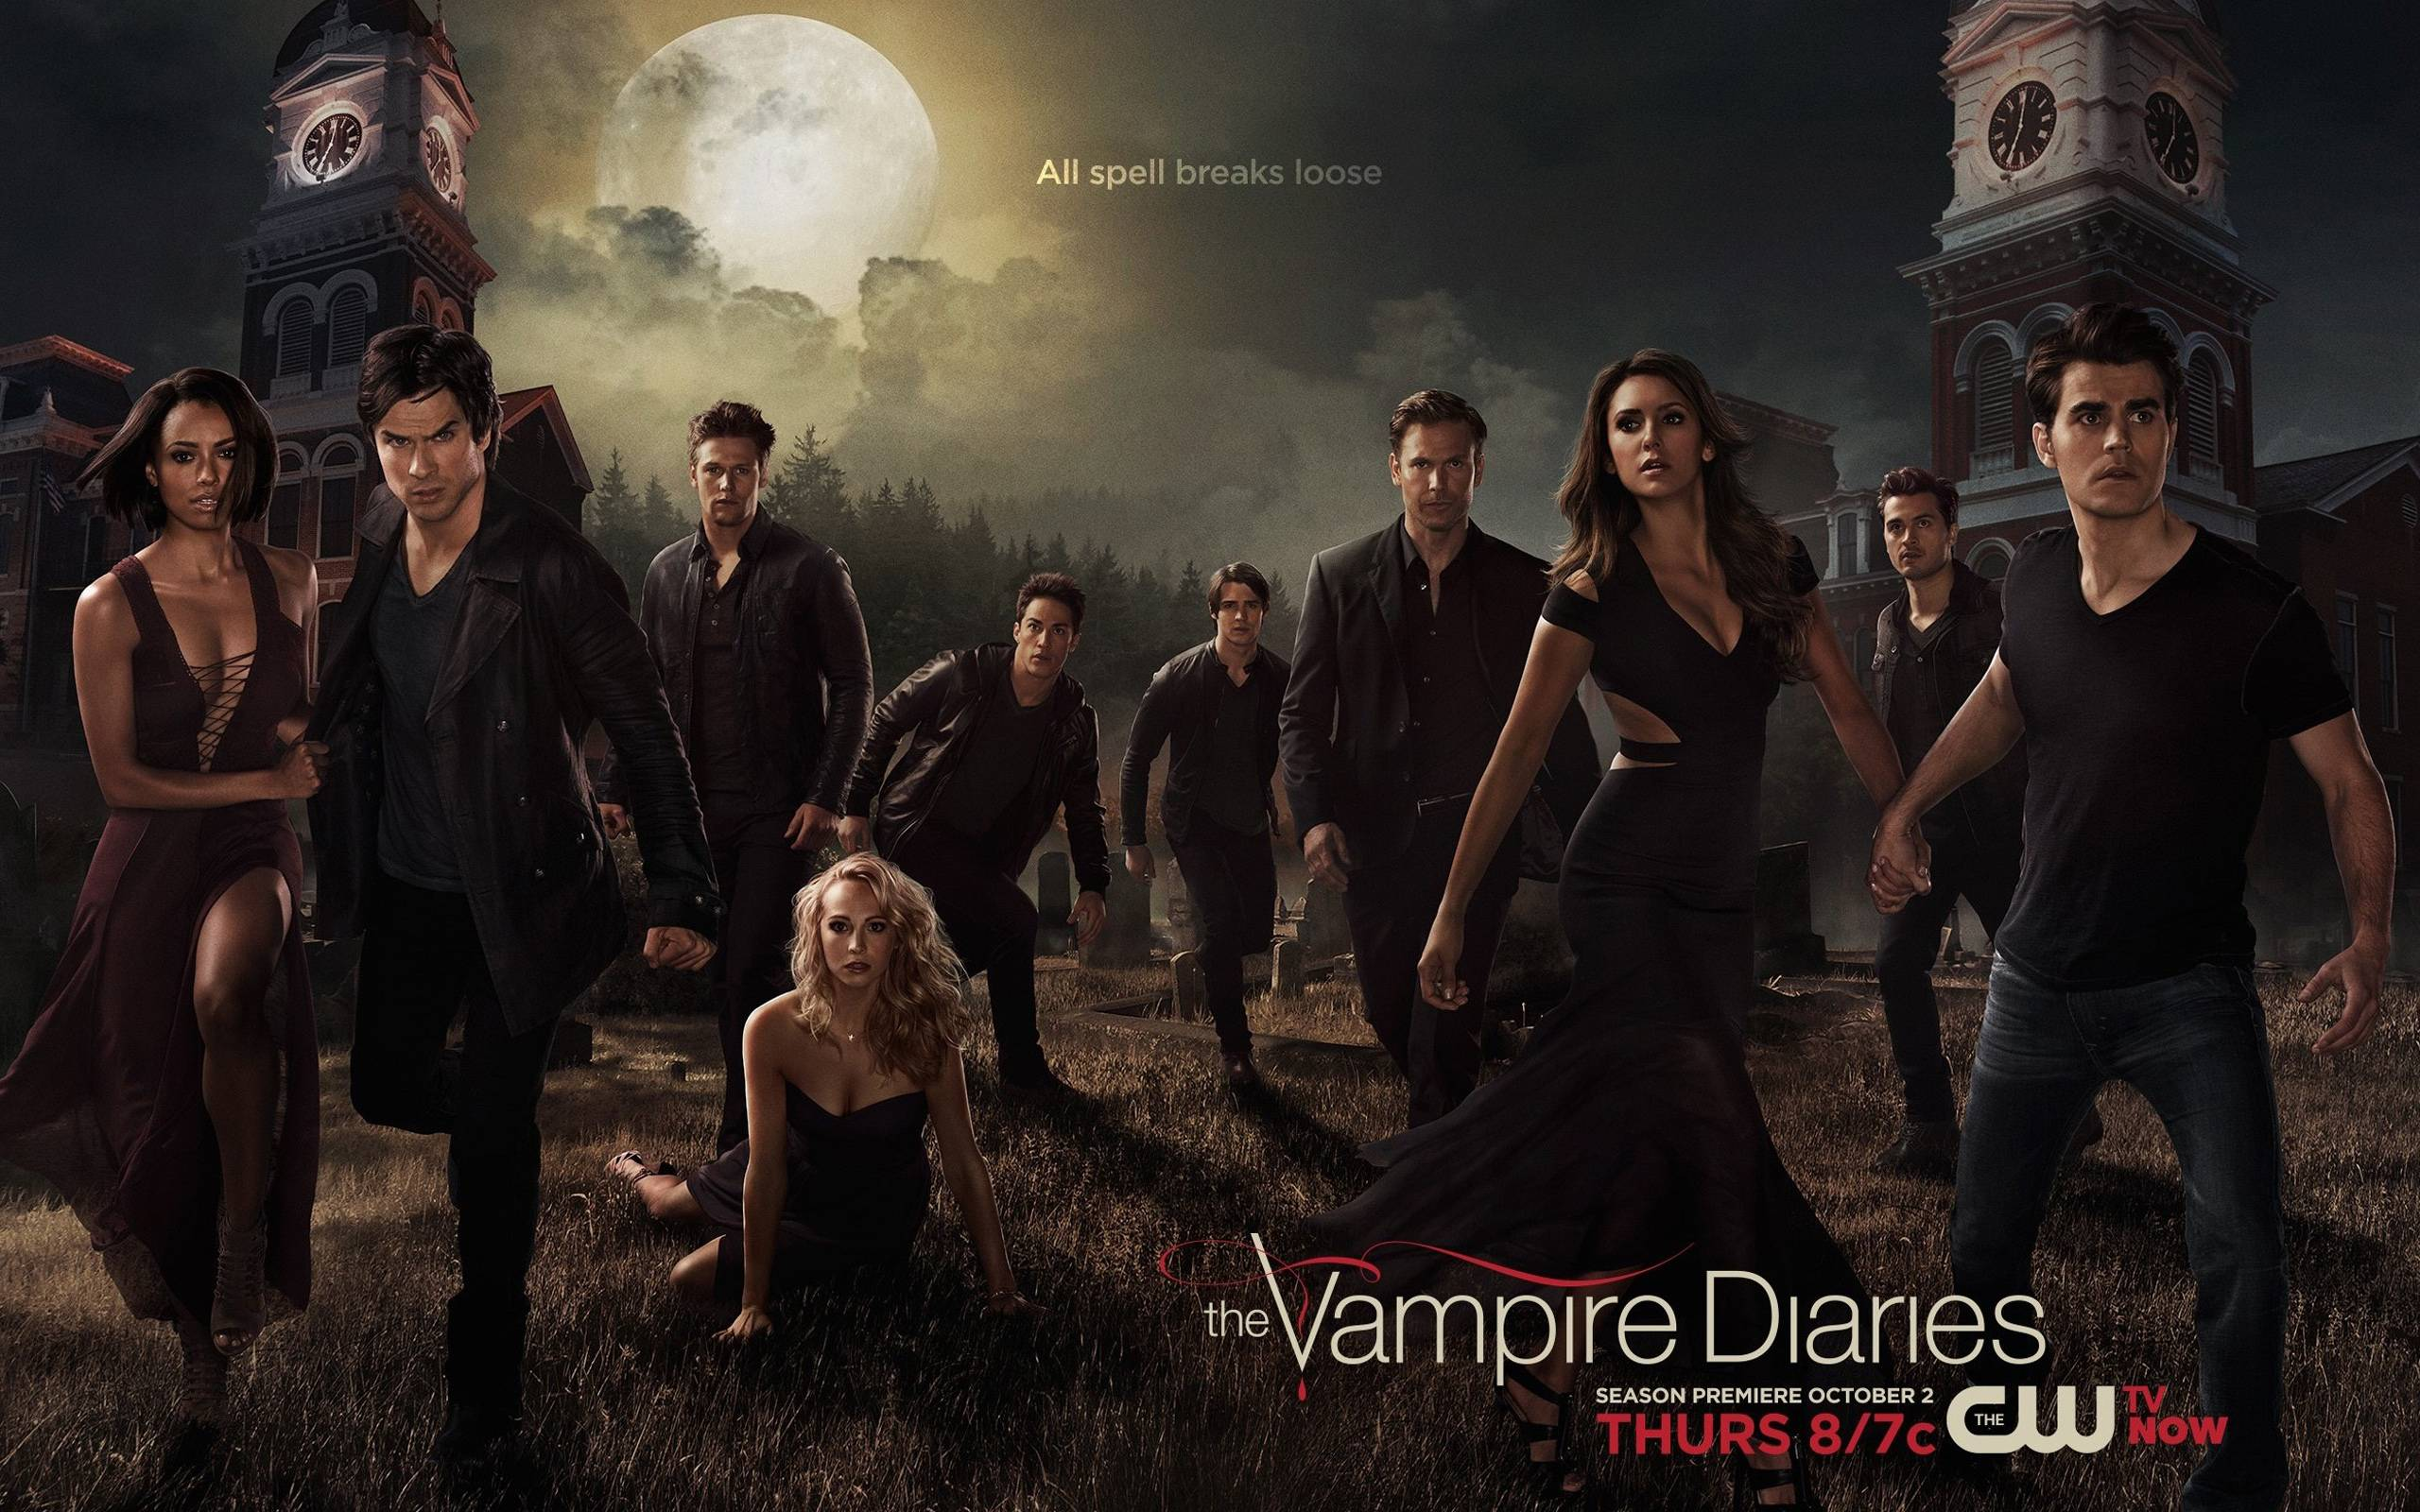 The Vampire Diaries Season 6 Wallpapers | HD Wallpapers